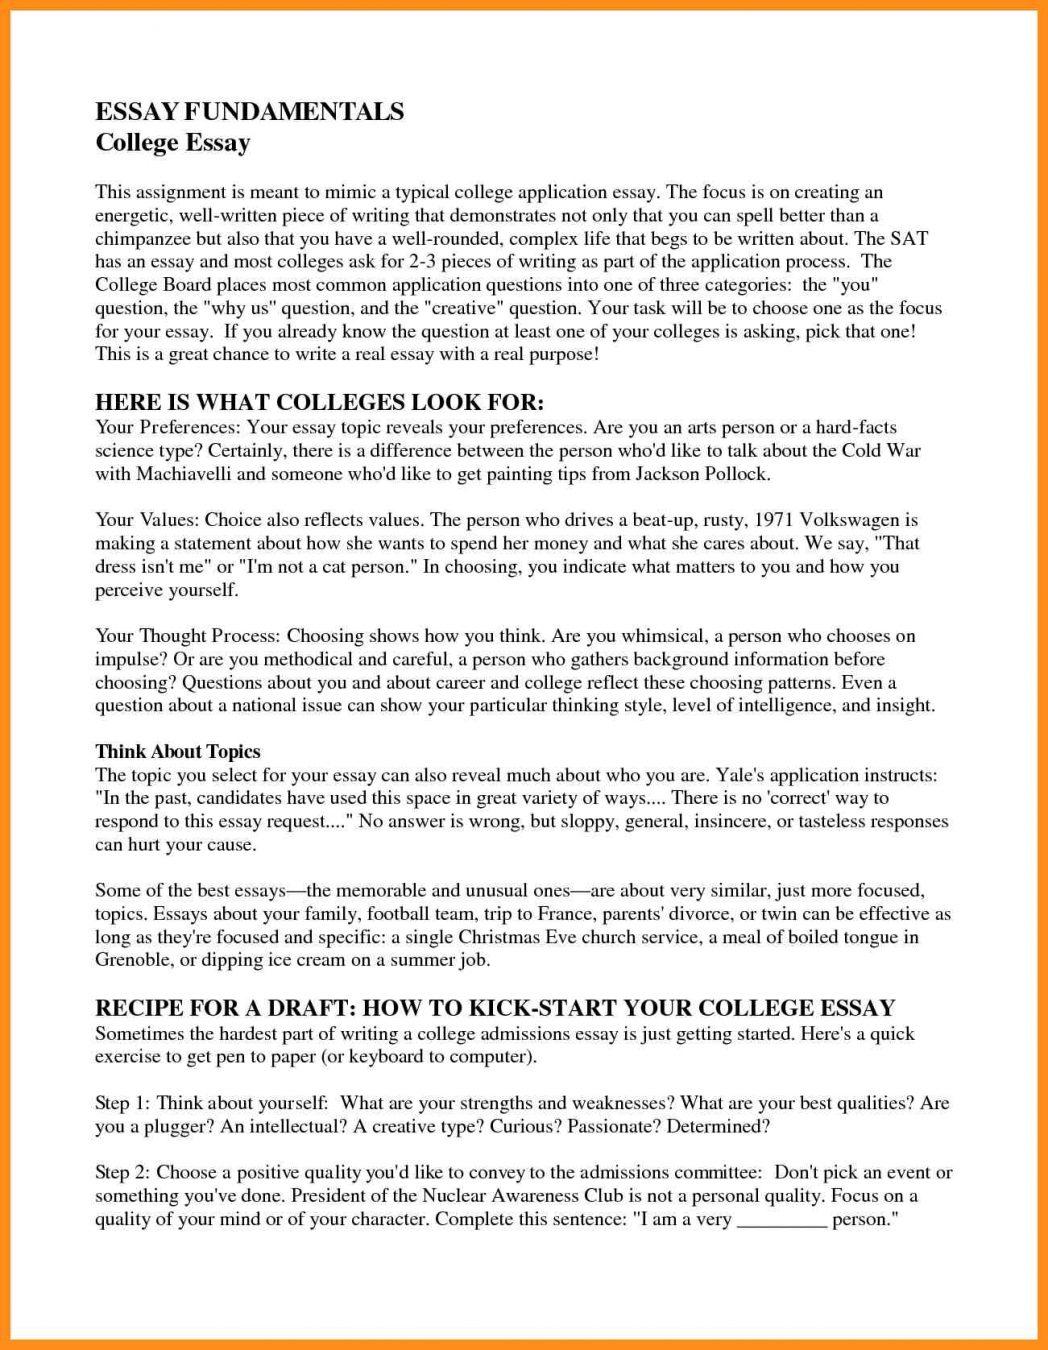 001 Essay Example Write Essays For Money Goal Blockety Co Writing College Newest Depict Jlirxaj Cash Best University High School Reddit Full